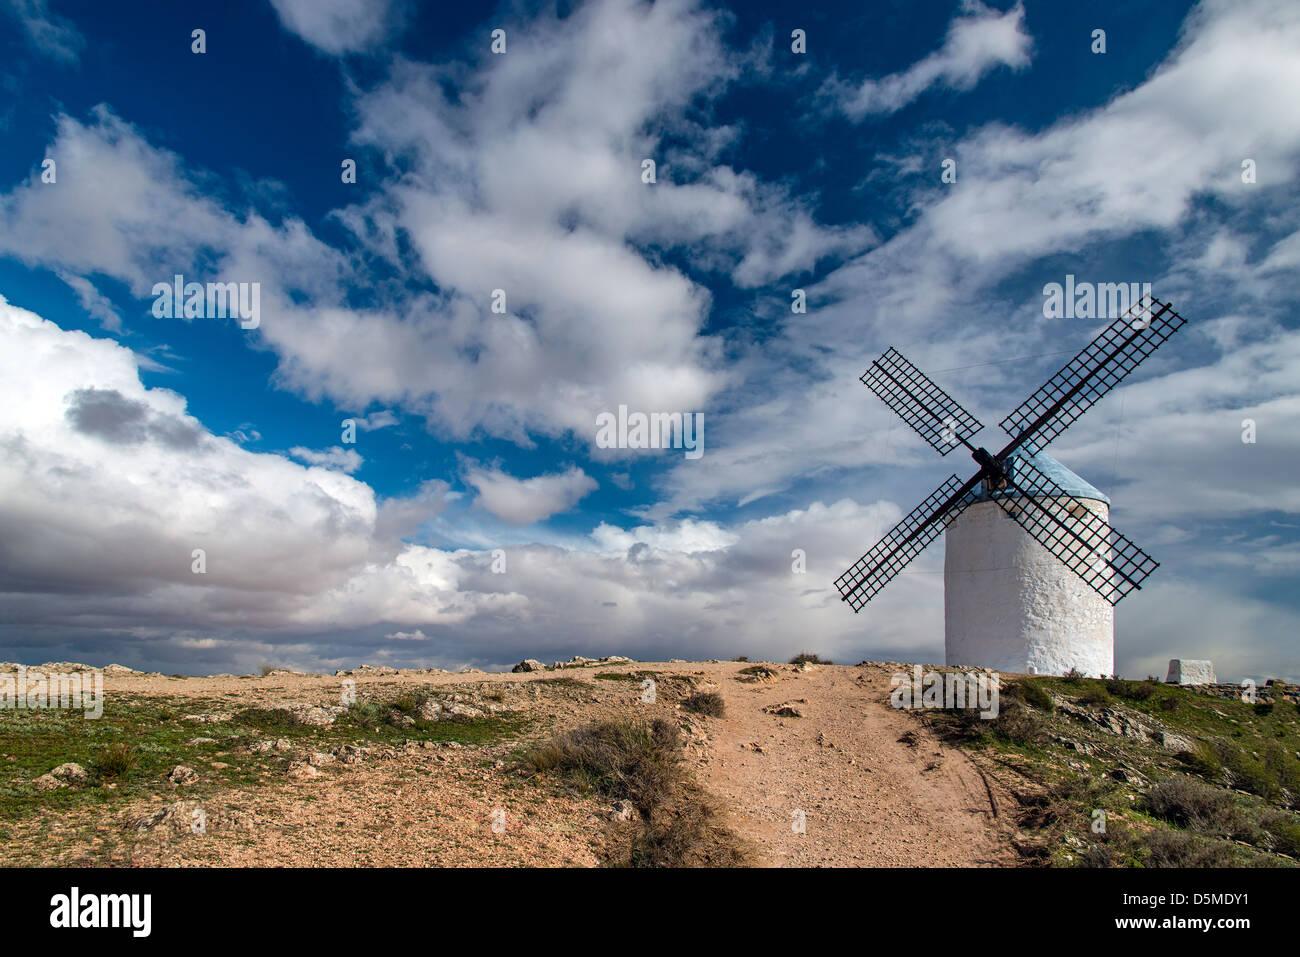 Typical Spanish windmill, Consuegra, Castile La Mancha, Spain - Stock Image